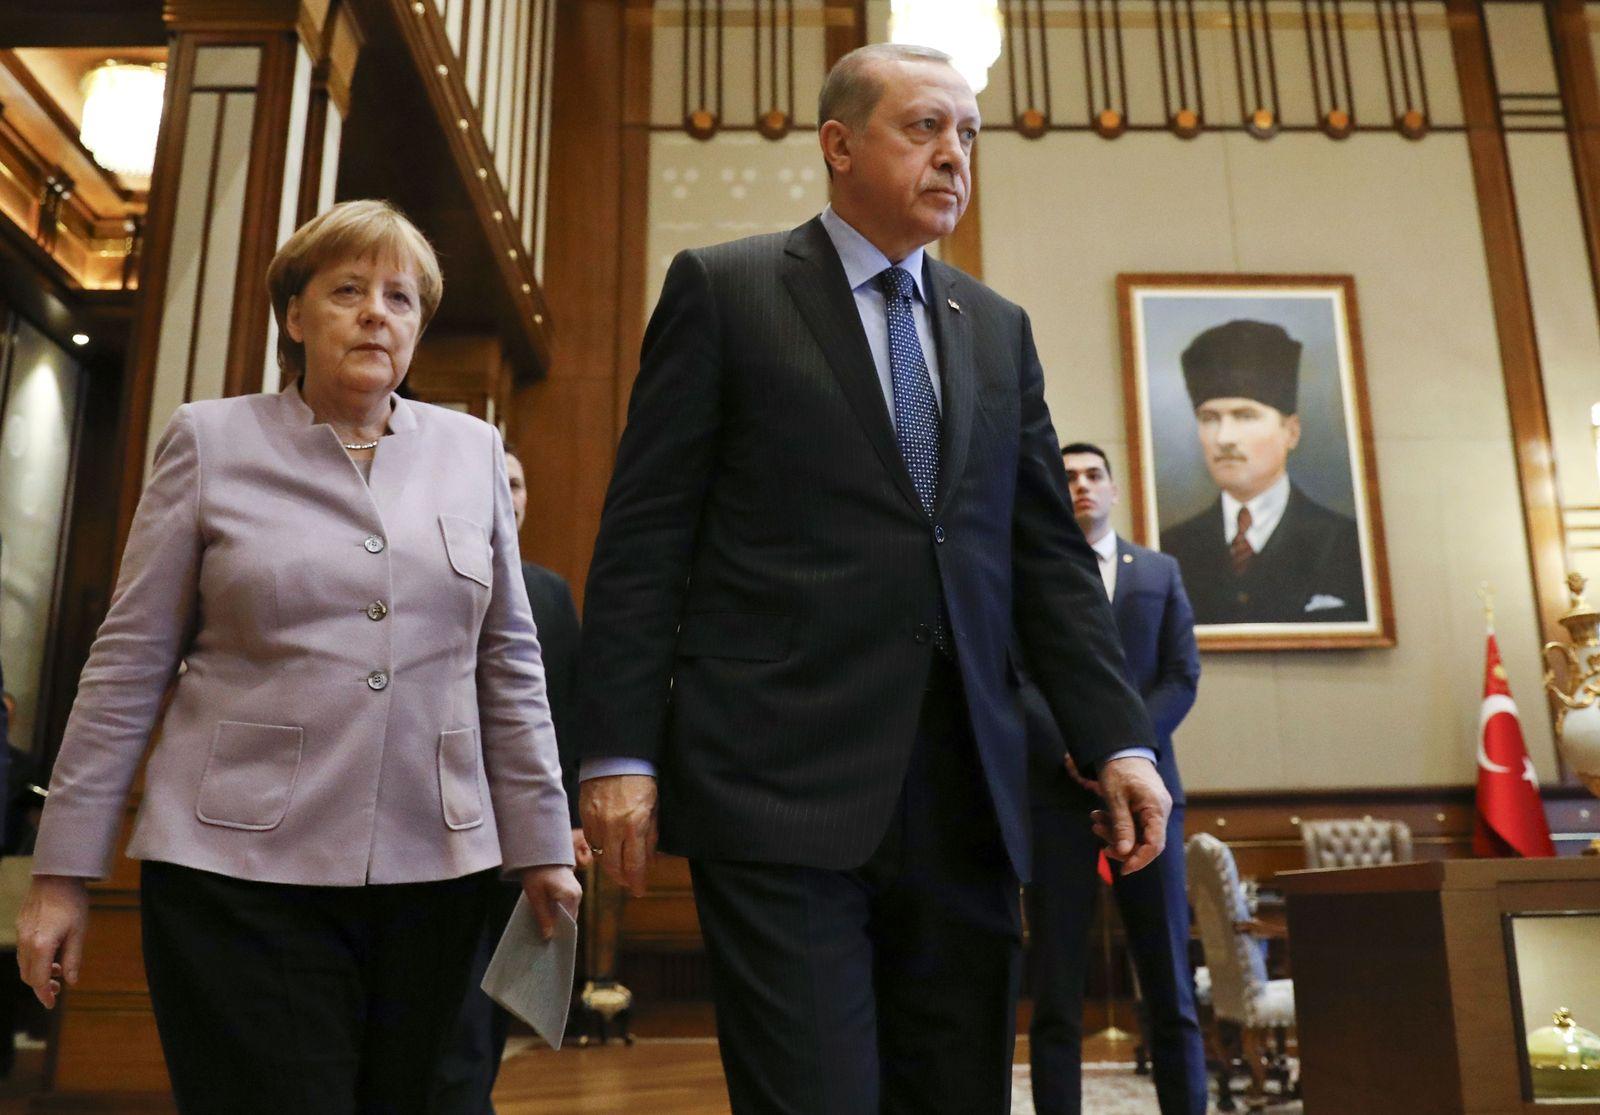 Angela Merkel / Recep Tayyip Erdogan